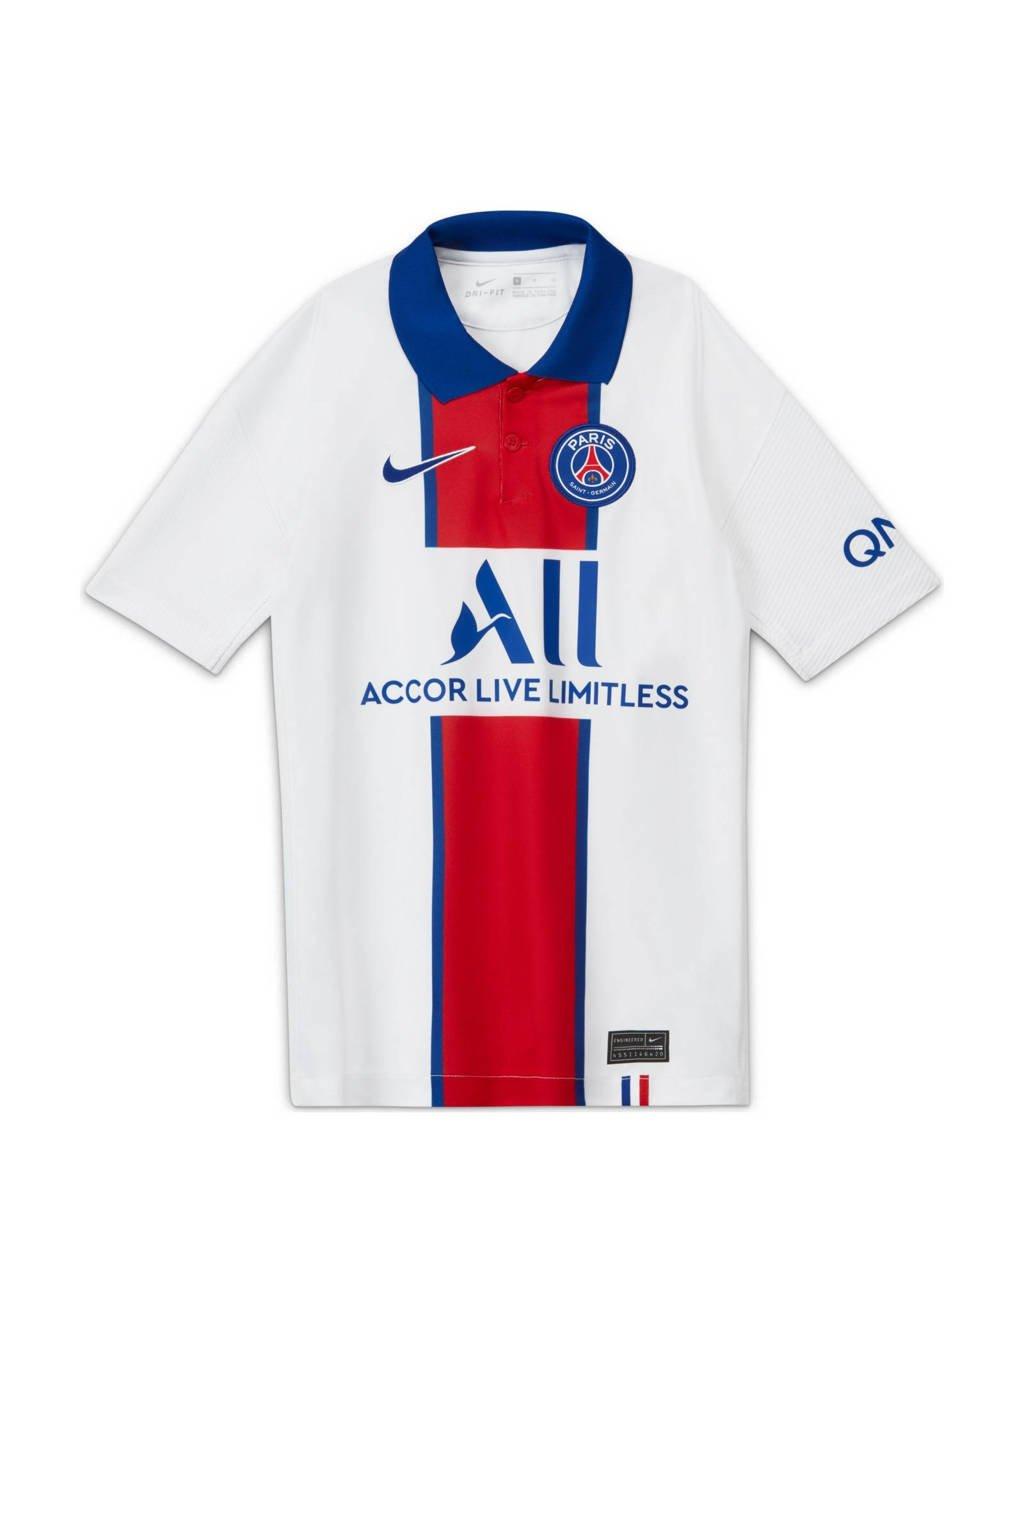 Nike Junior Paris Saint Germain voetbalshirt wit/blauw/rood, Wit/blauw/rood